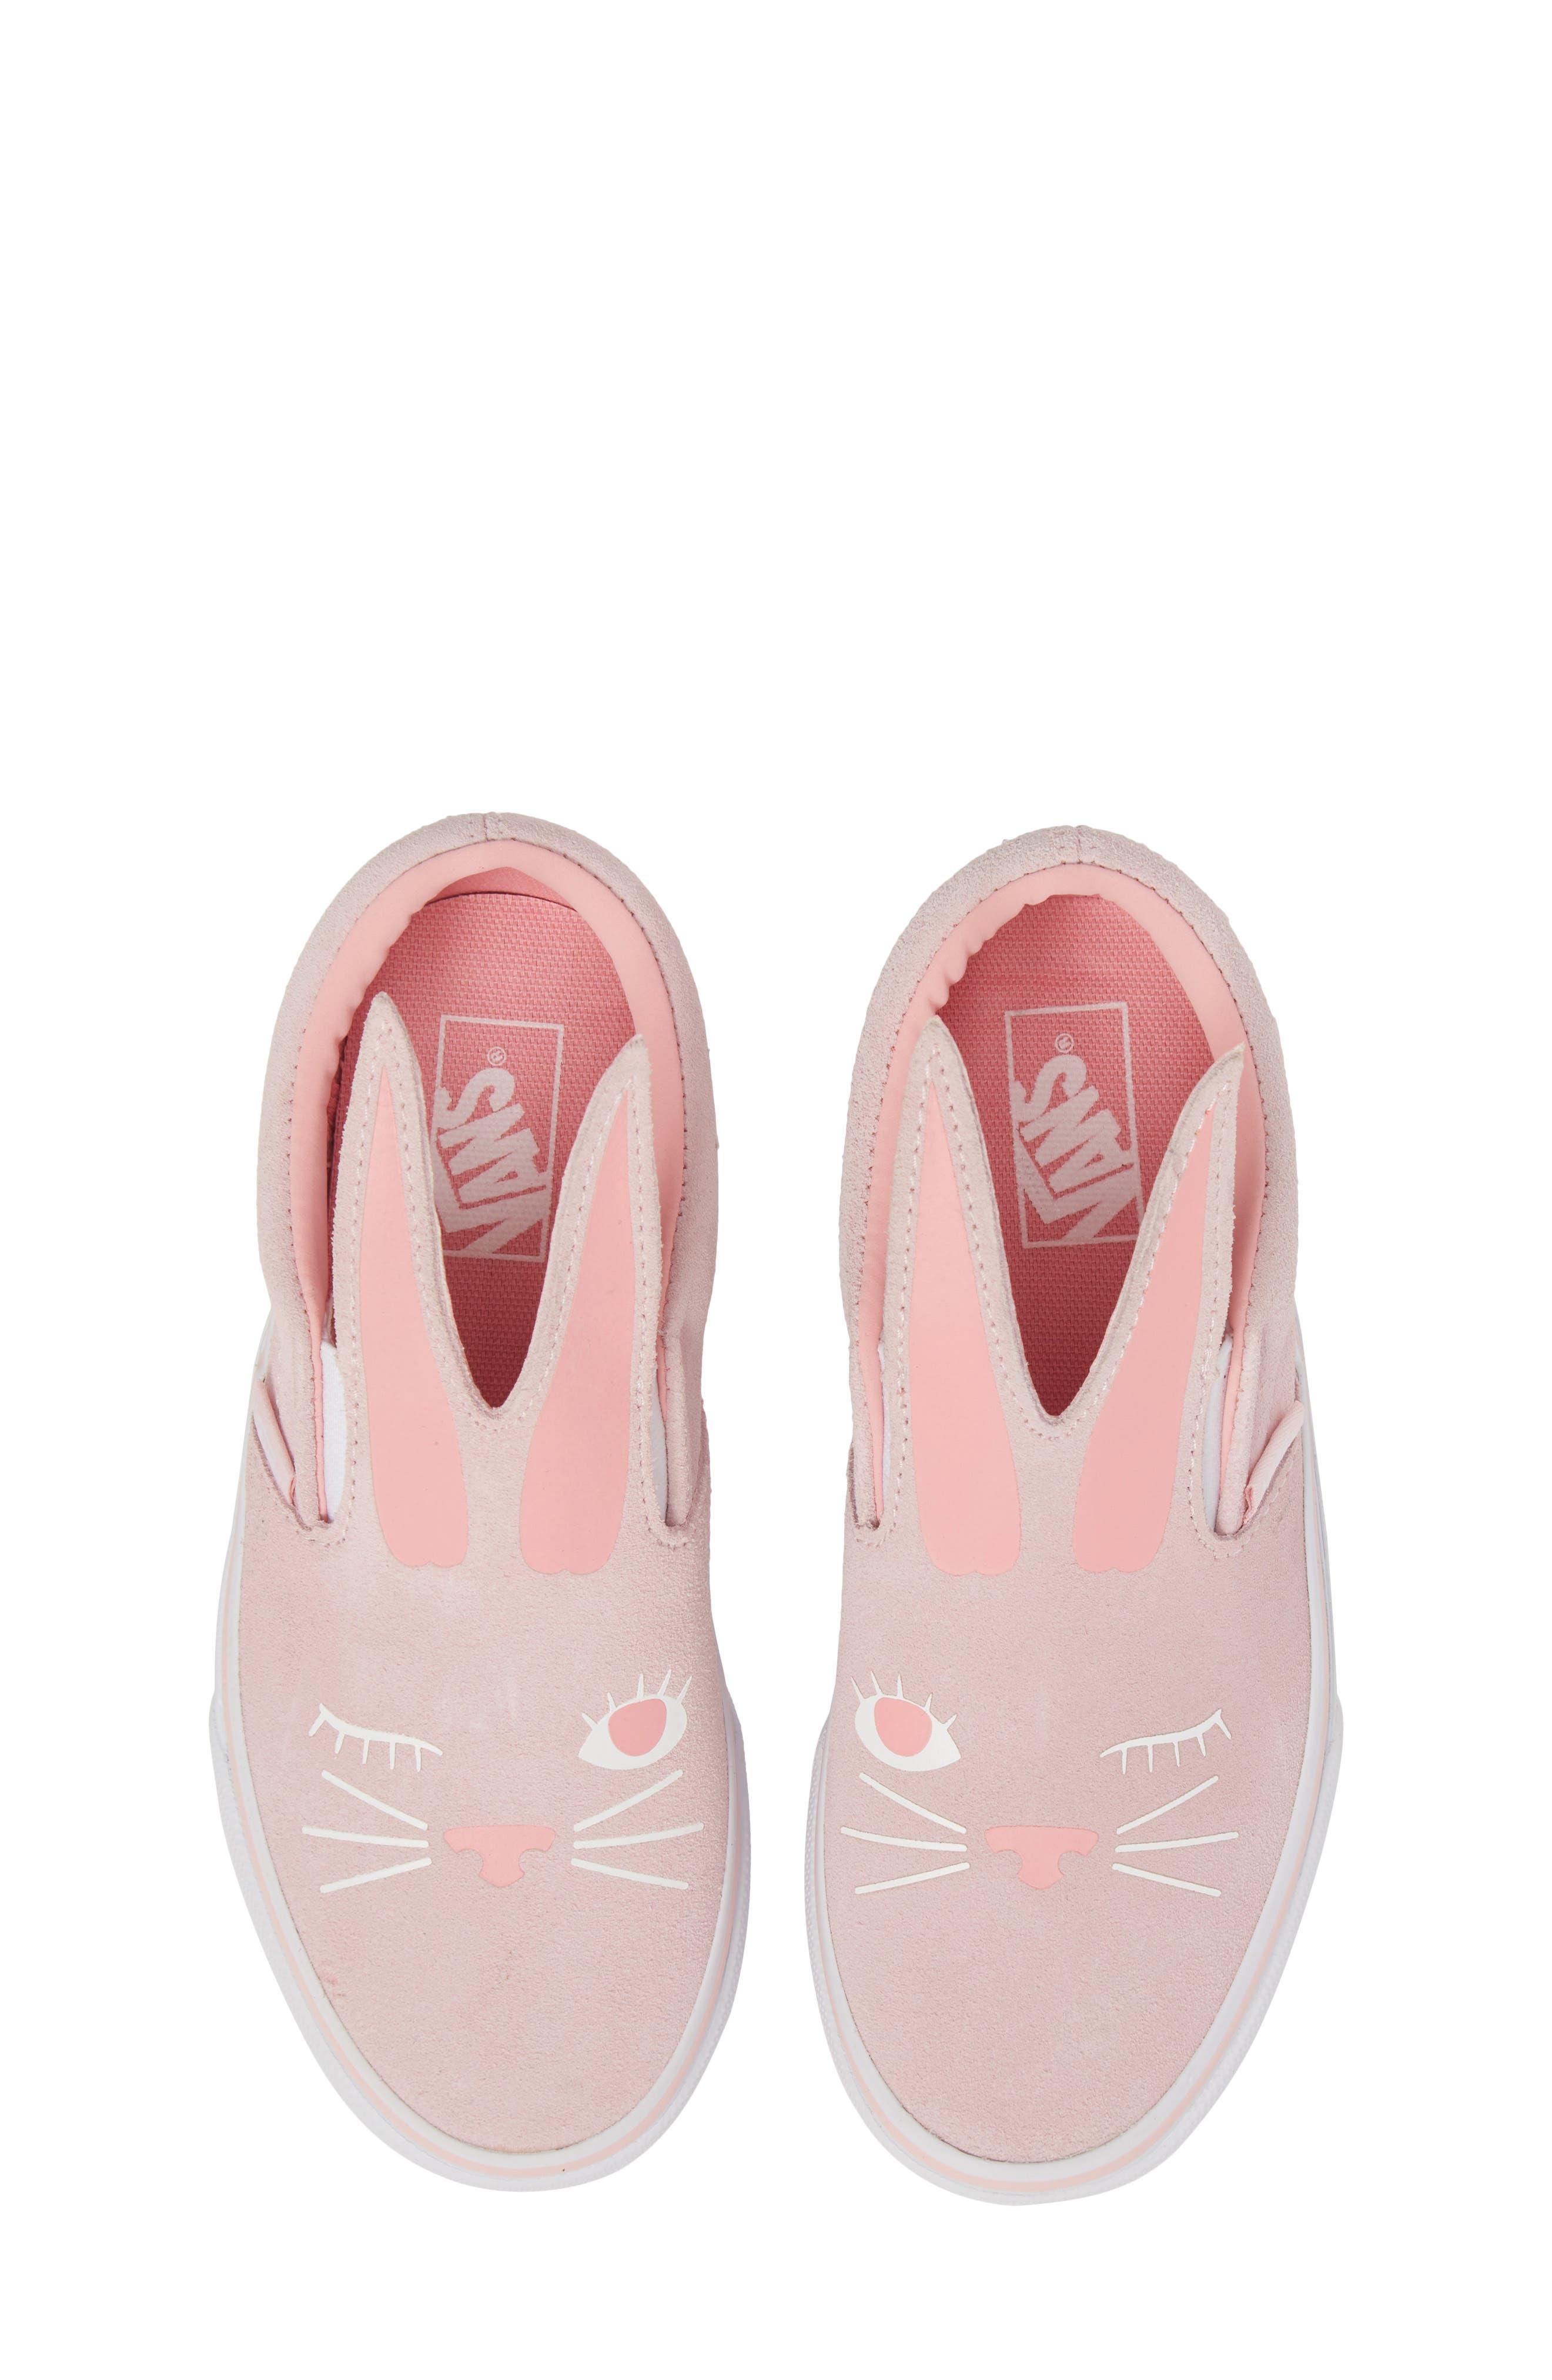 Vans Slip-On Bunny Sneaker (Toddler, Little Kid & Big Kid)